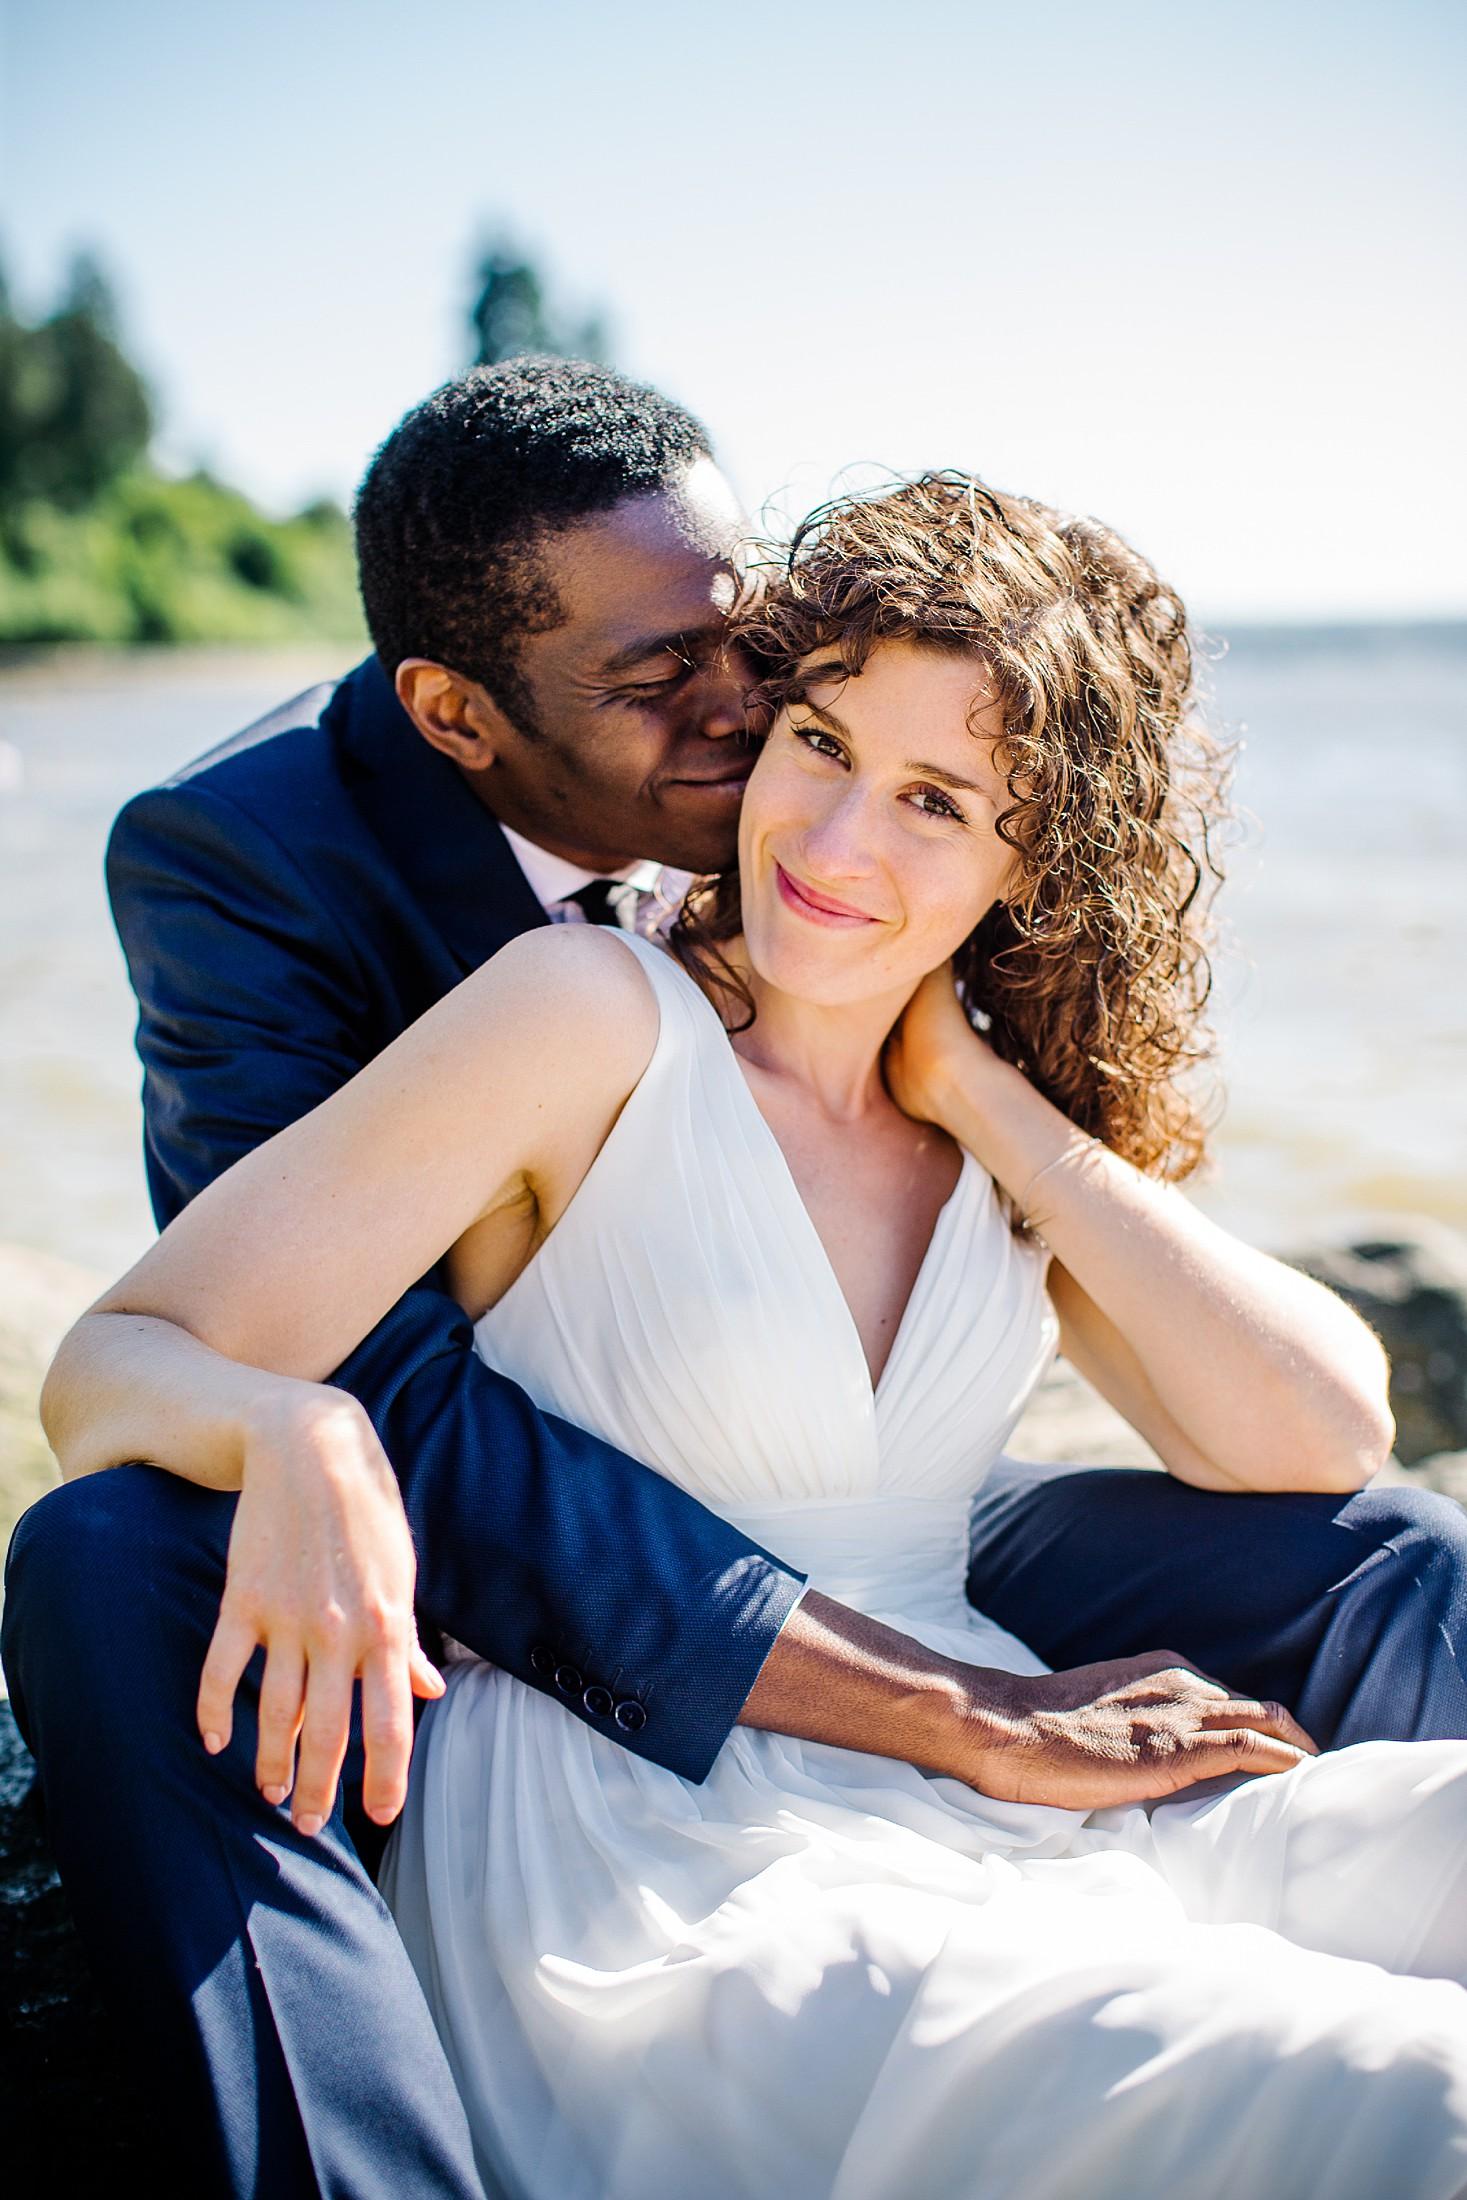 May28.AvalonJohnnie9661_Note Photography Documentary Photographer Wedding Photos Vancouver B.C. Best of 2018 2019 2020 Vancouver Island Okanagan Banff Edmonton Victoria.jpg